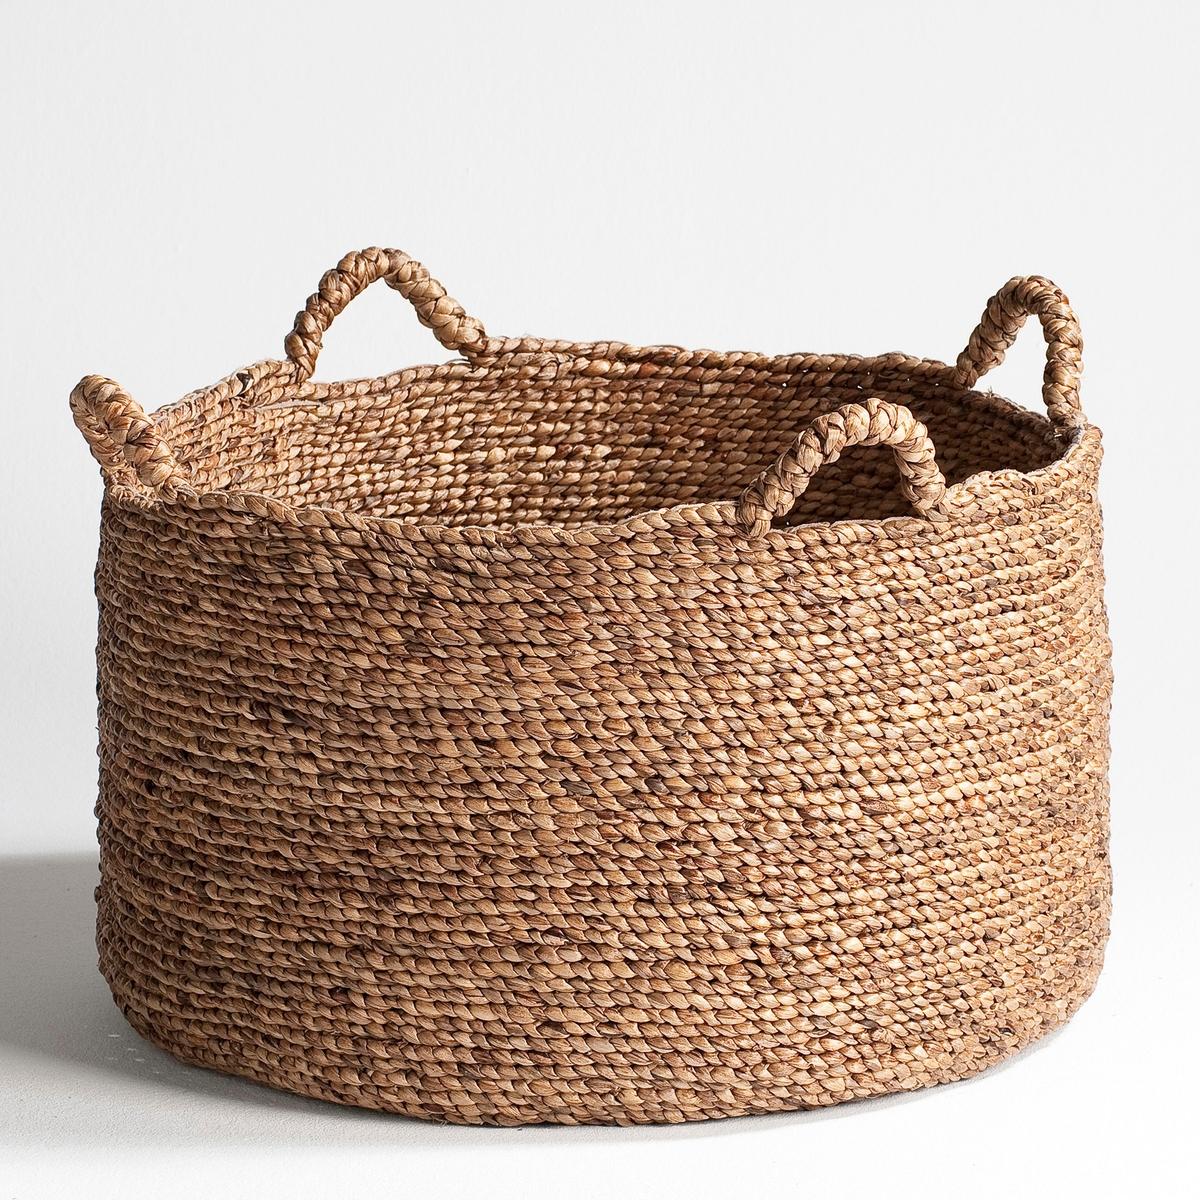 Круглая плетеная корзина В37 см, Raga корзина для игрушек shantou gepai корзина для игрушек лапки 41x50cm 635775